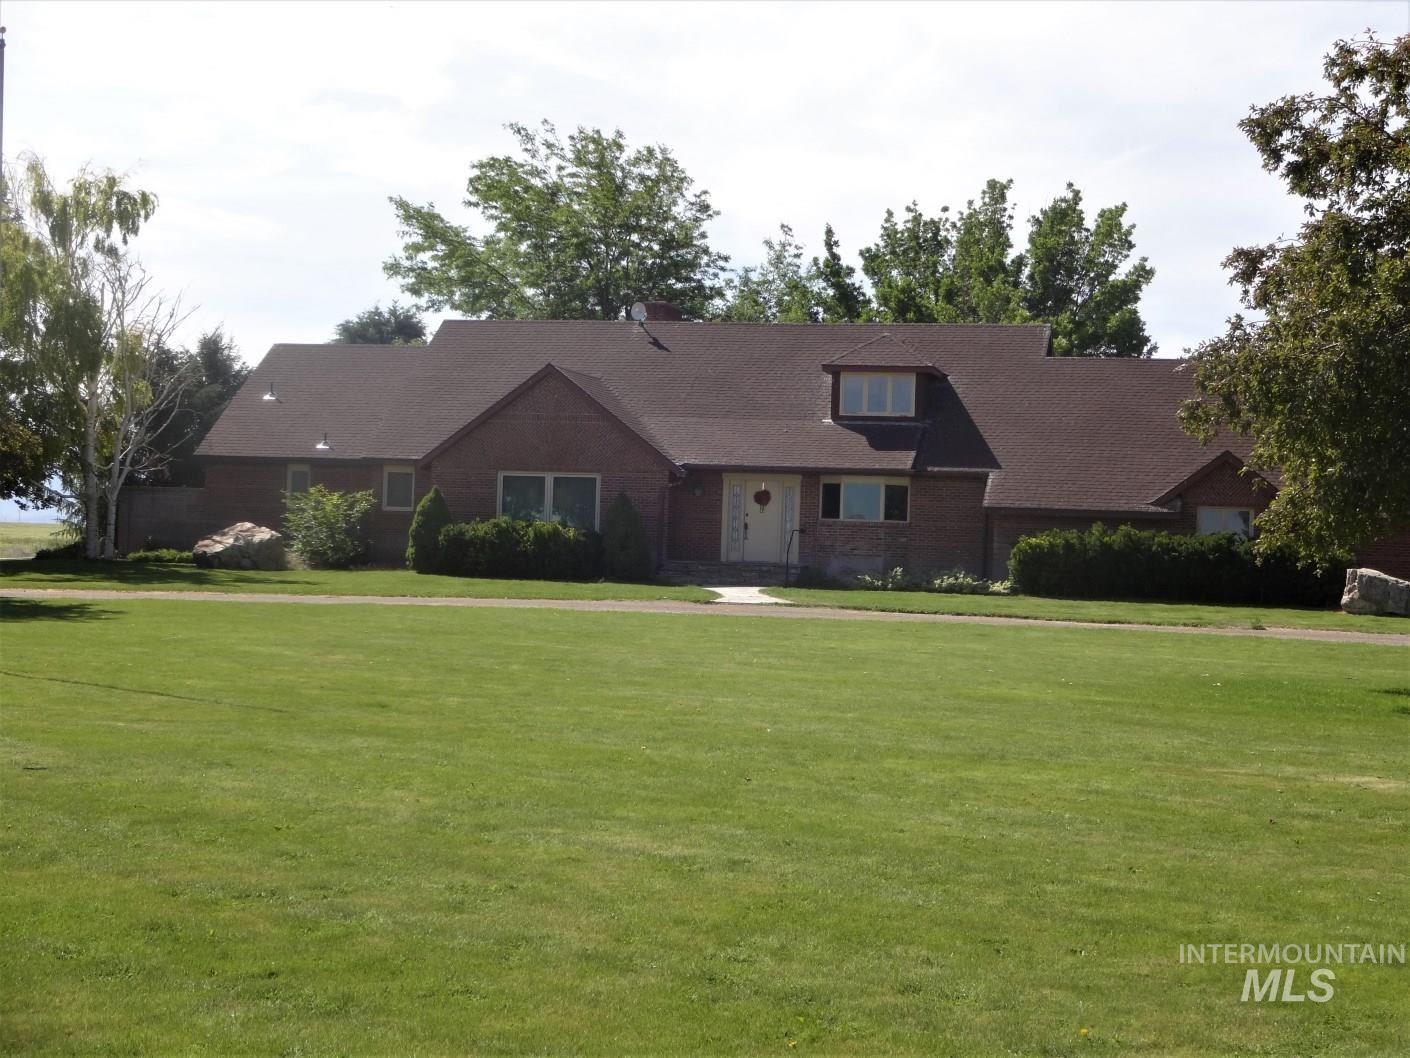 Photo of 1445 W 800 S, Murtaugh, ID 83344 (MLS # 98768600)